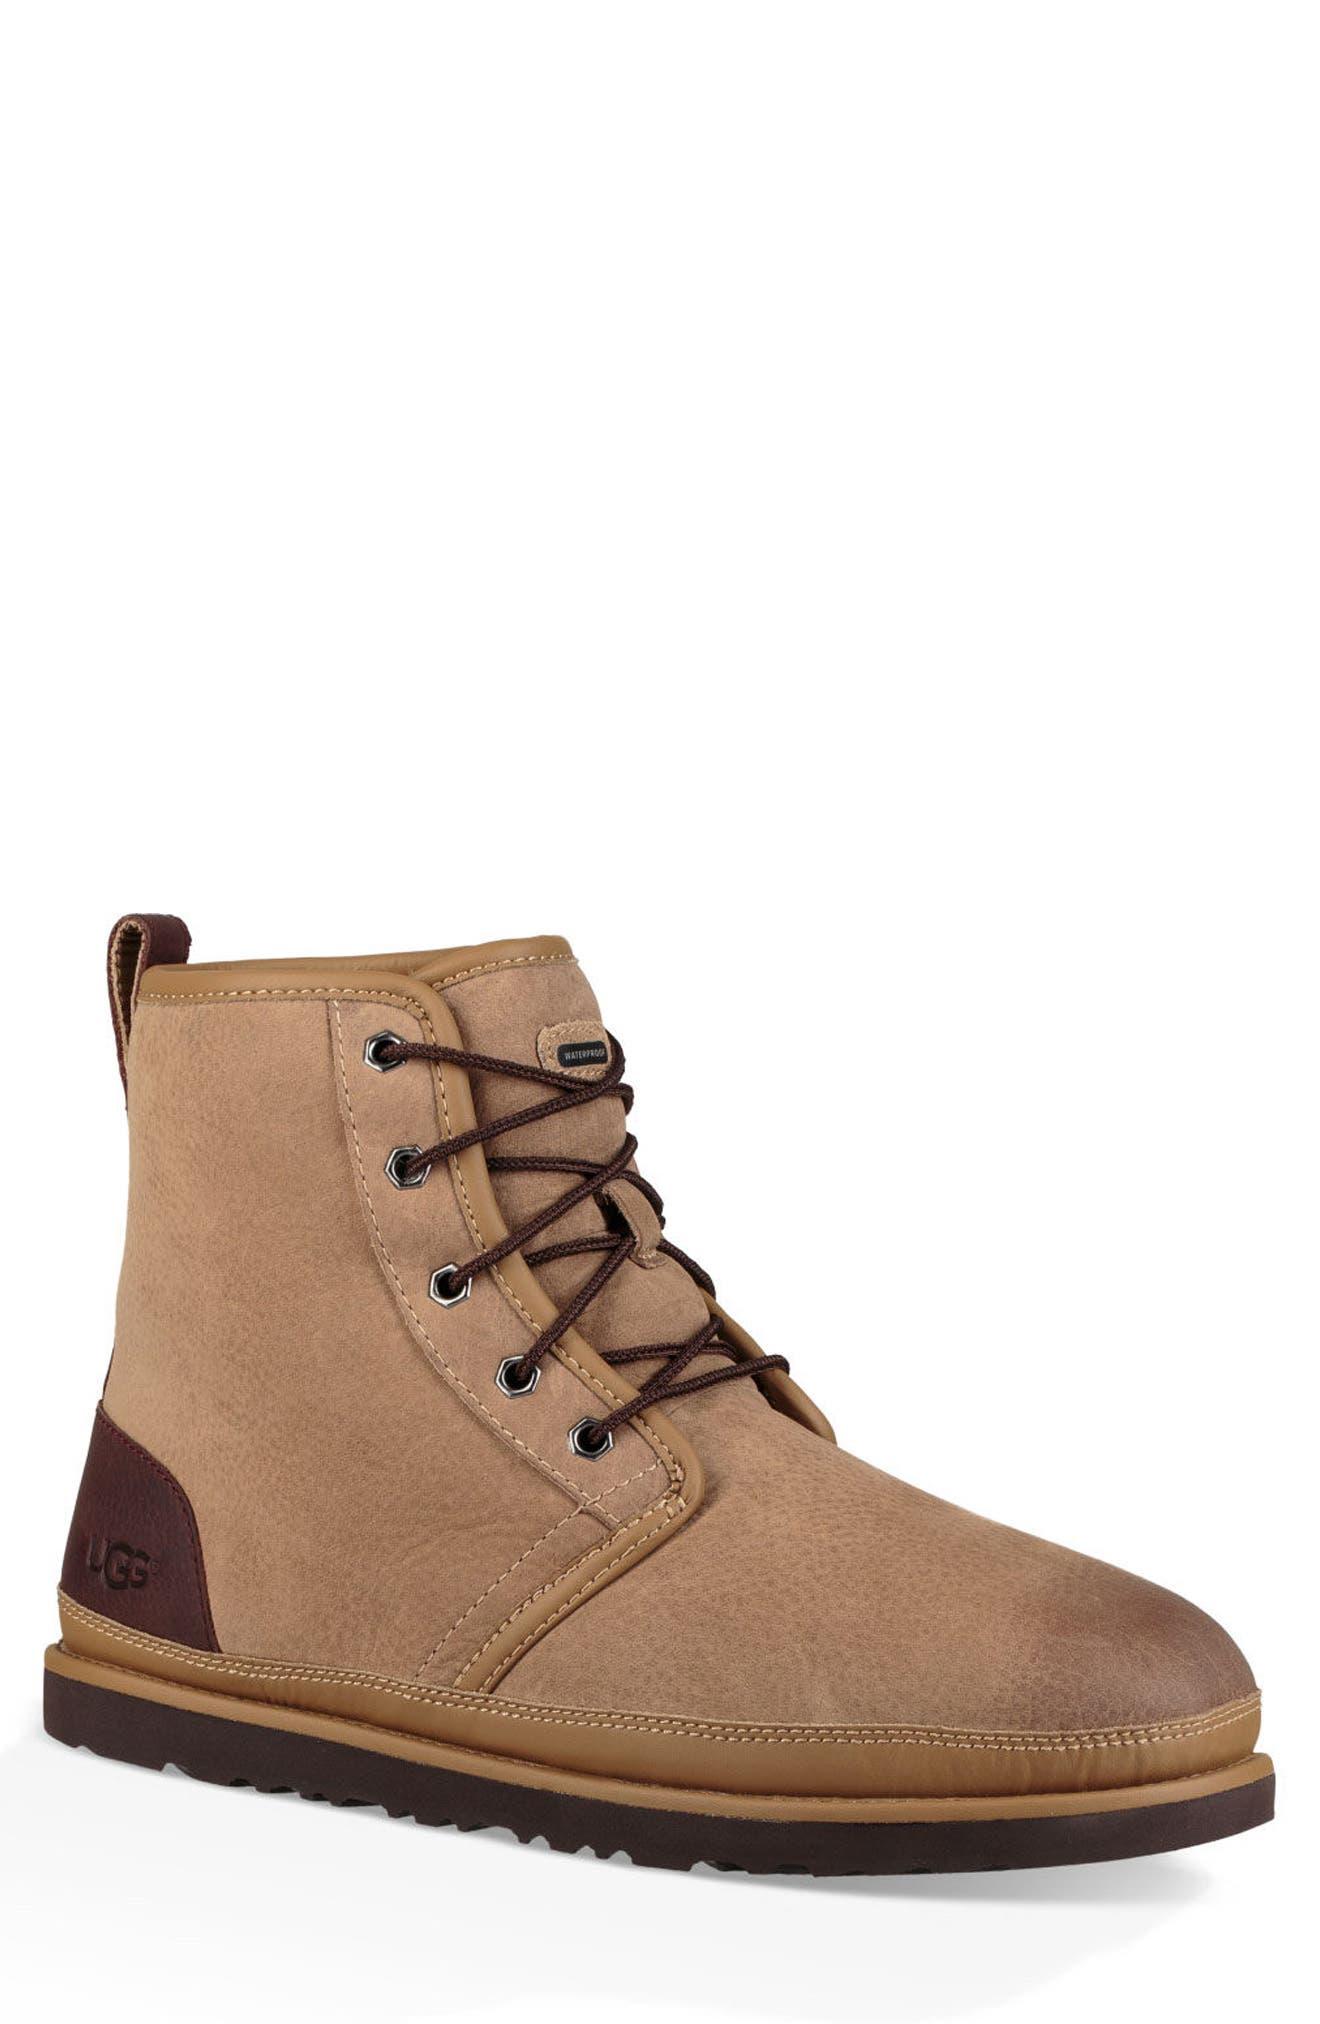 Ugg Harkley Waterproof Lace-Up Boot, Brown